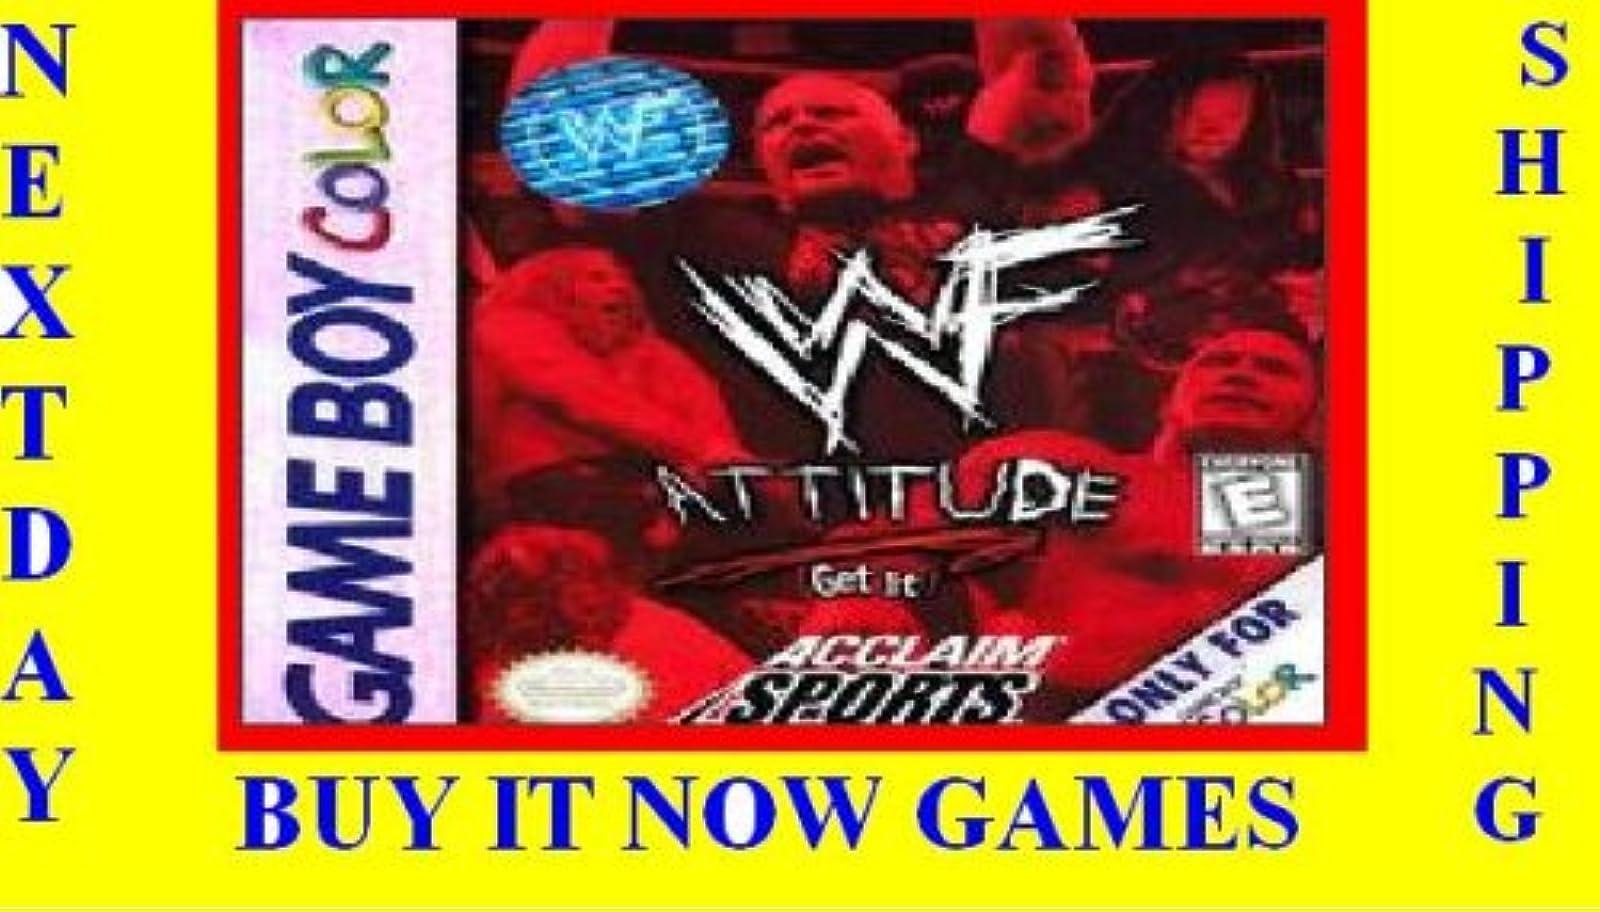 WWF Attitude Wrestling On Gameboy Color